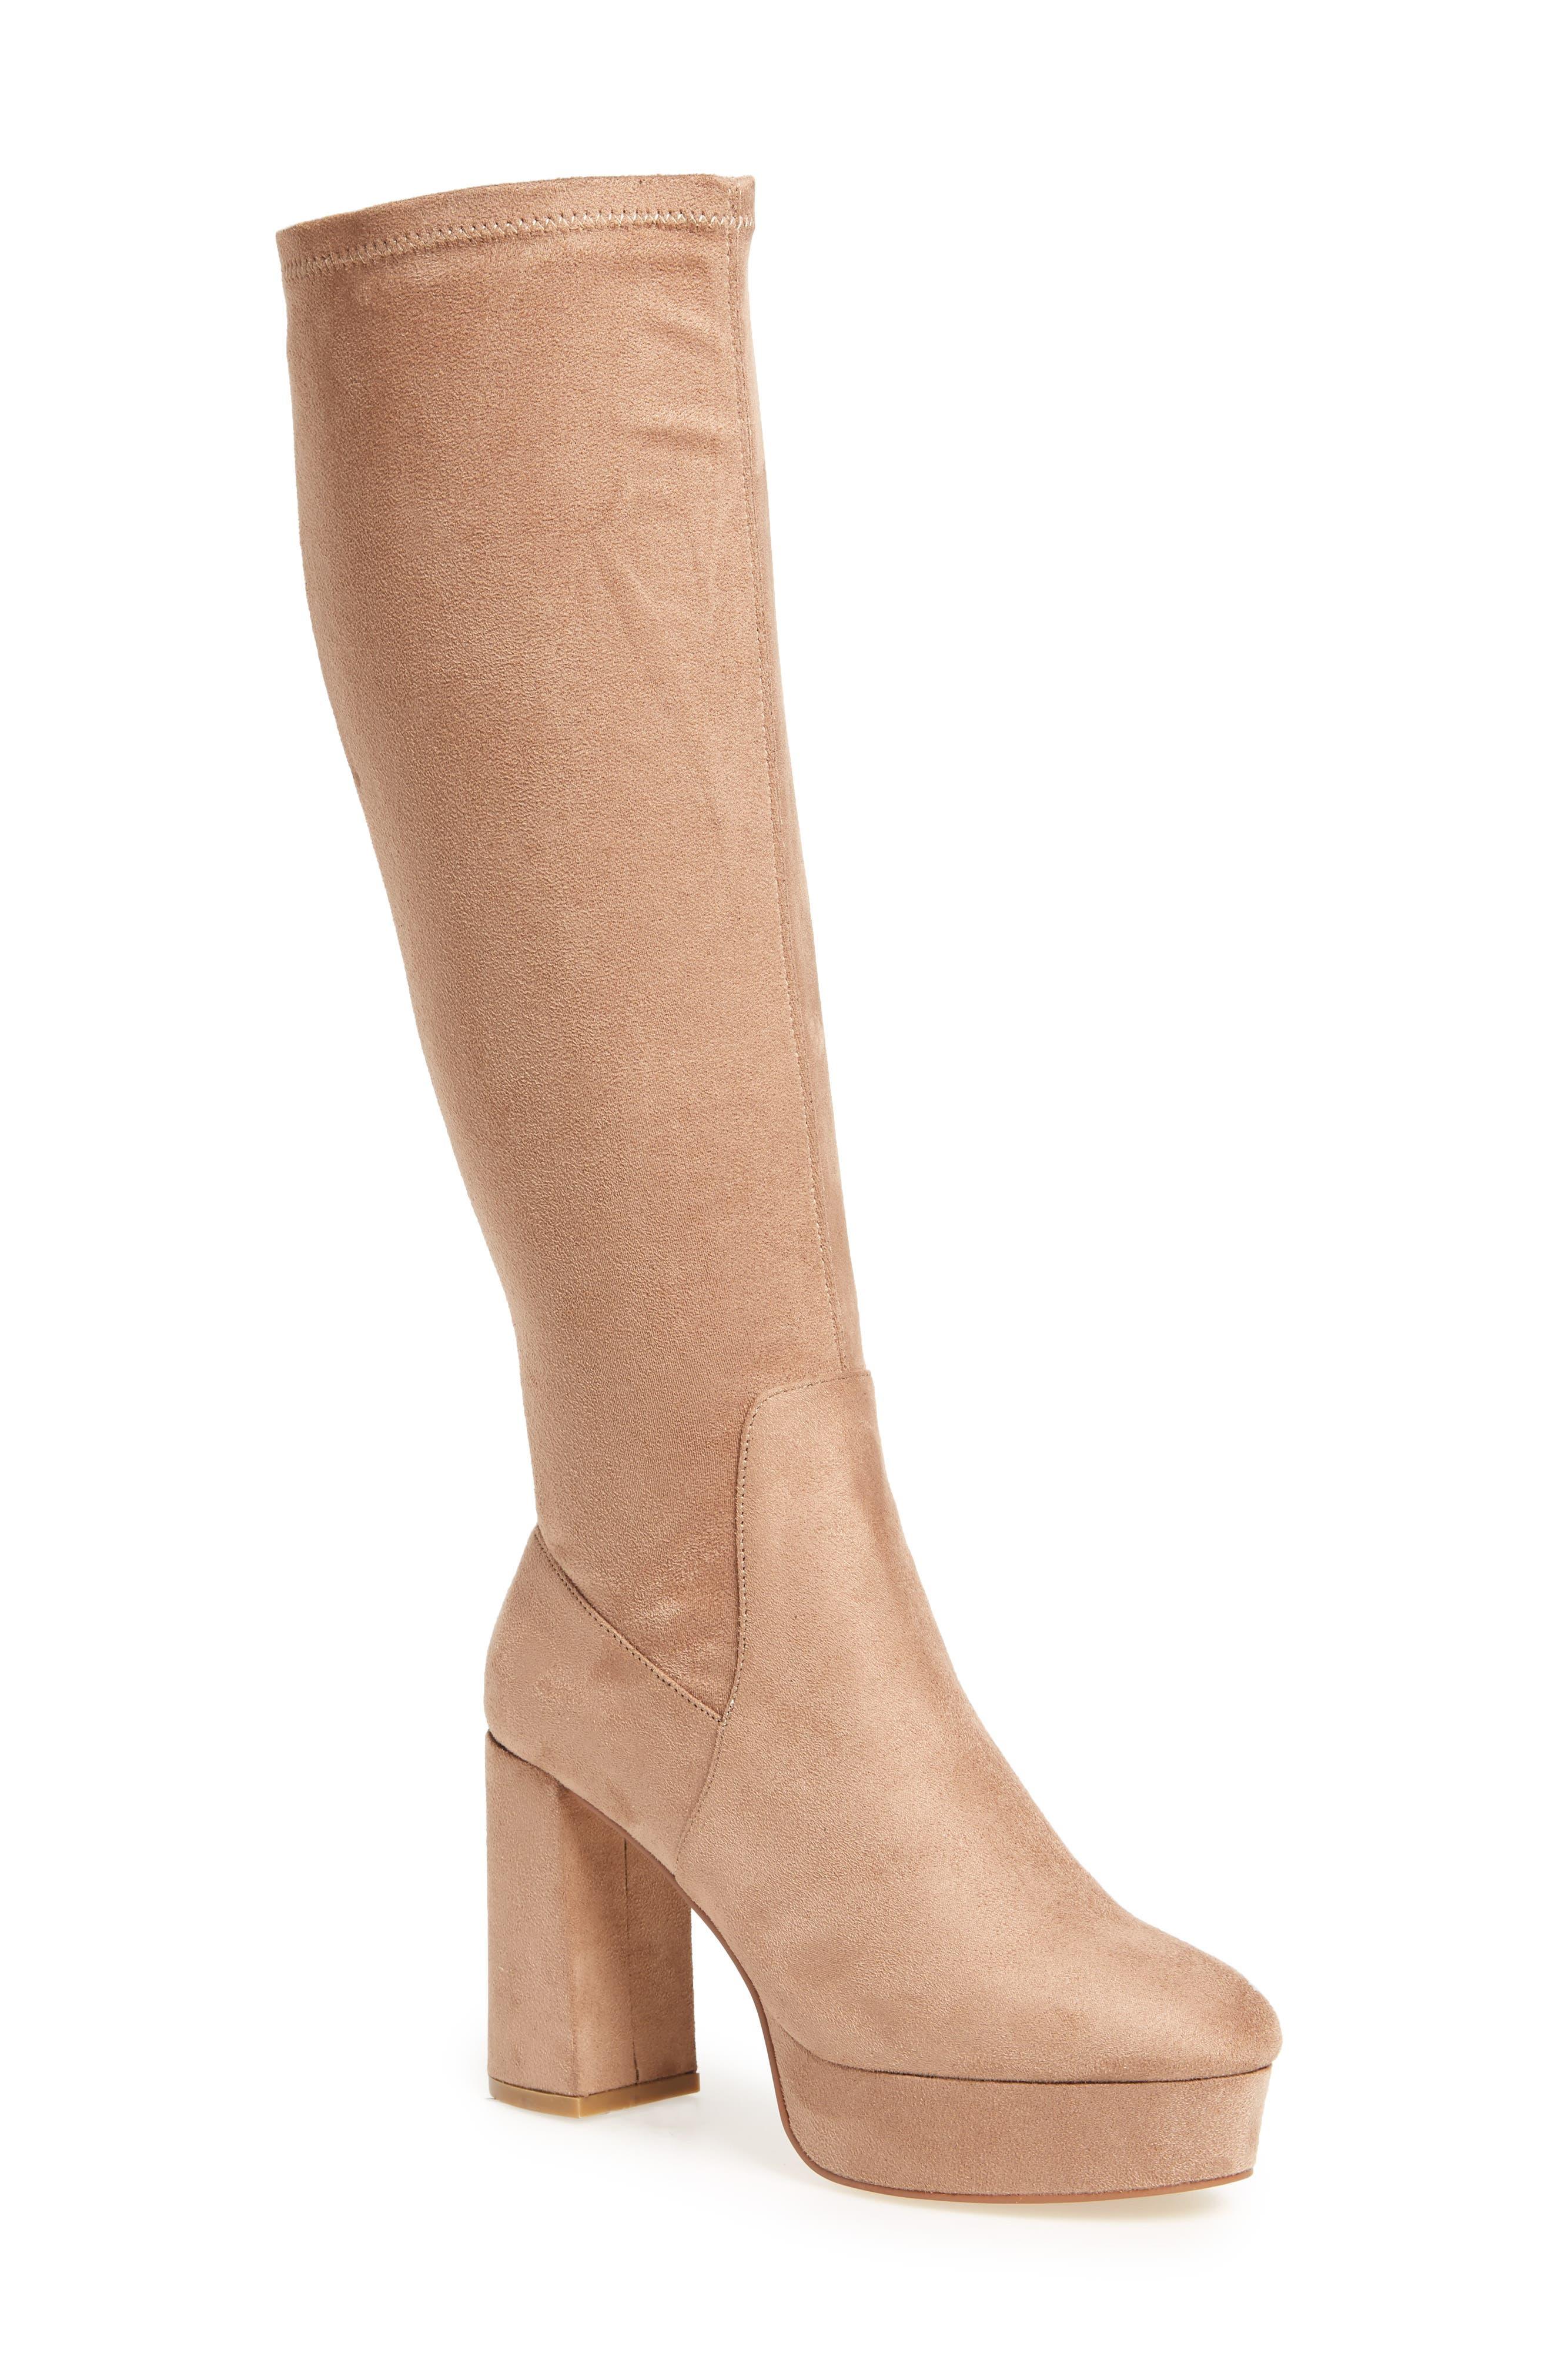 Alternate Image 1 Selected - Chinese Laundry Nancy Knee High Platform Boot (Women)